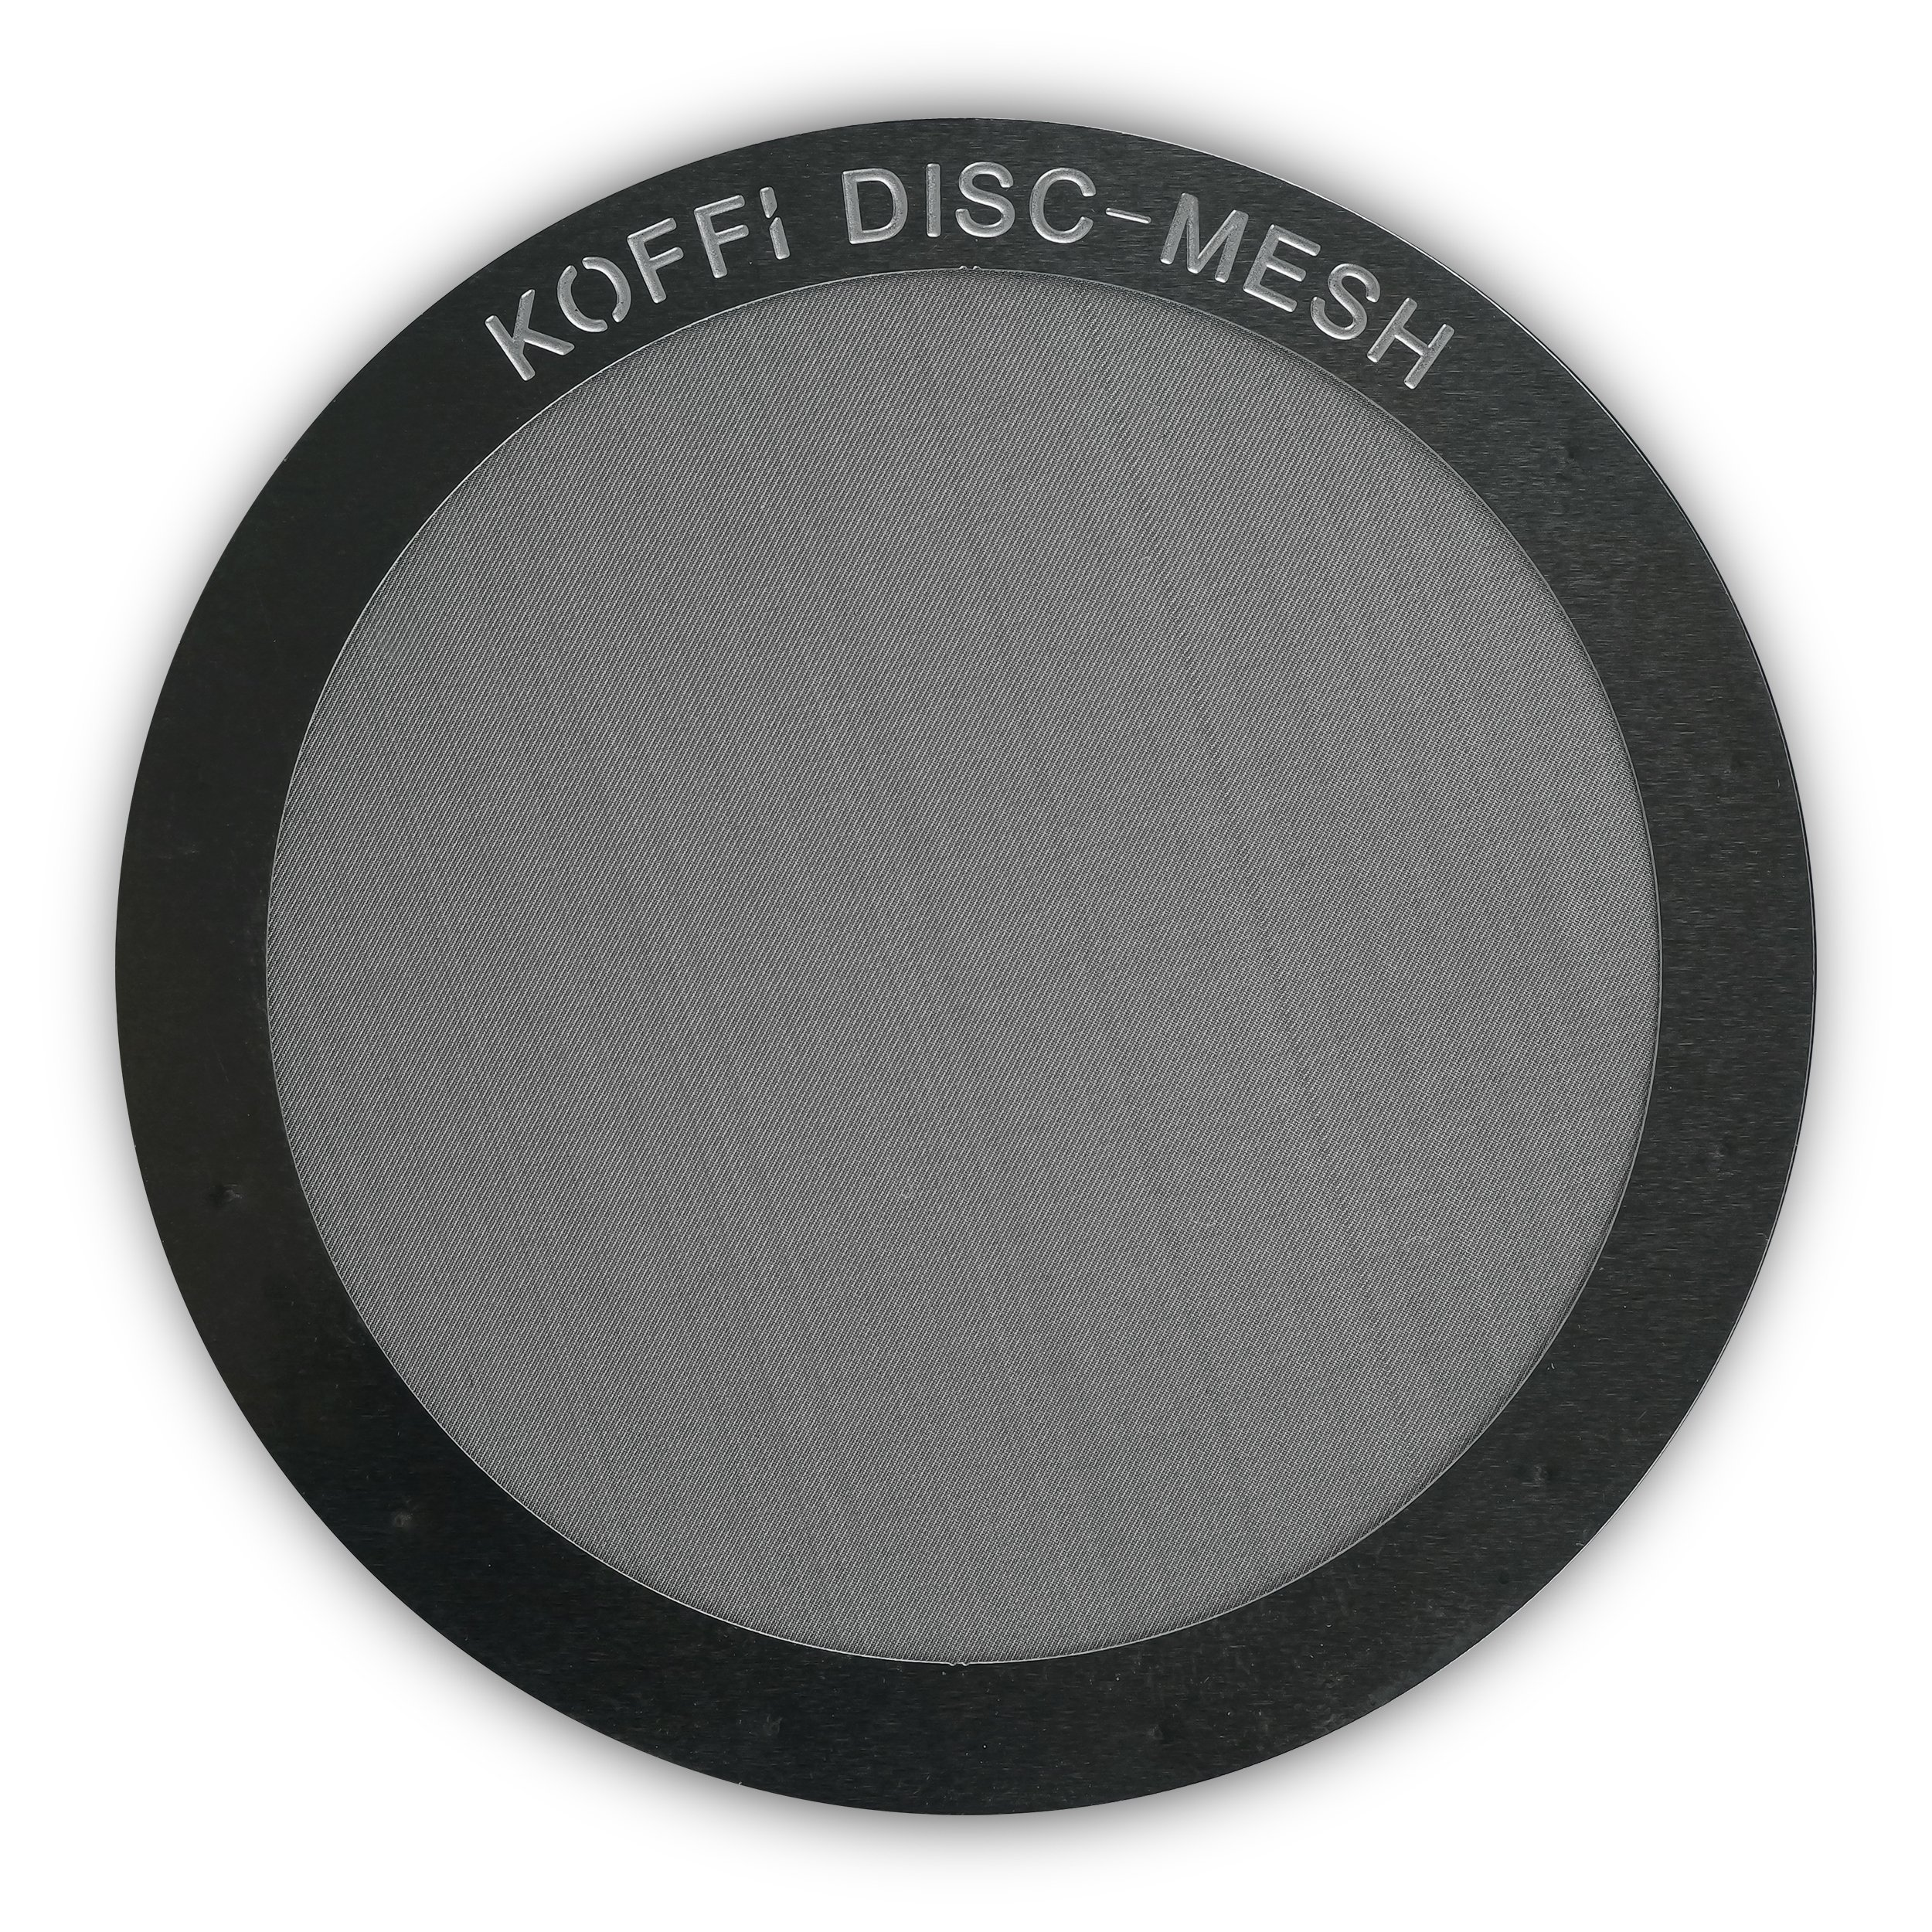 KOFFI ® DISC - Metal Filter for AeroPress - Reusable - Stainless Steel Ultra Fine Mesh Disk - for Better Tasting Coffee